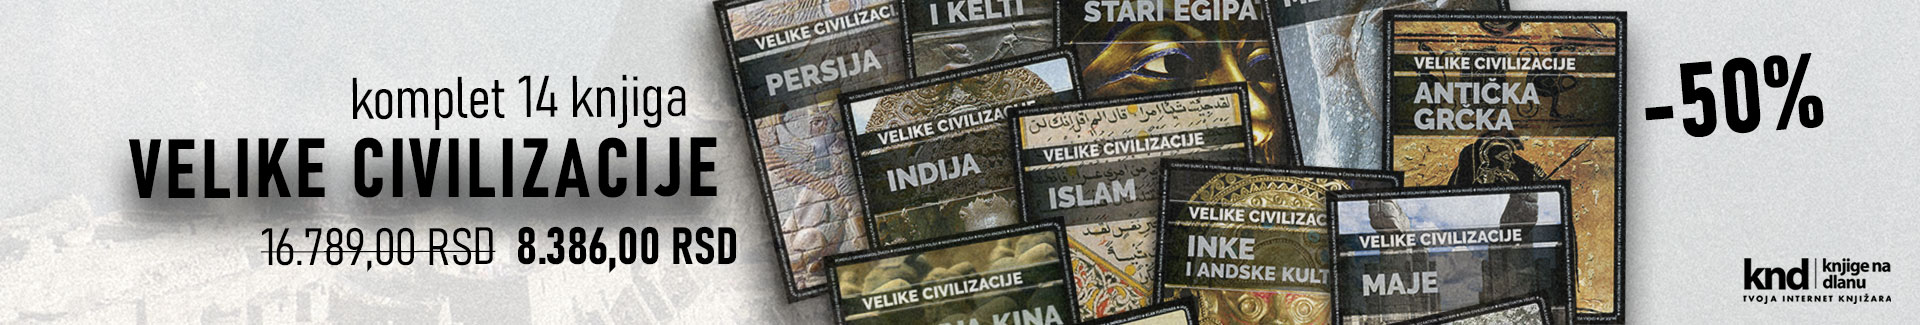 Velike civilizacije – komplet 14 knjiga